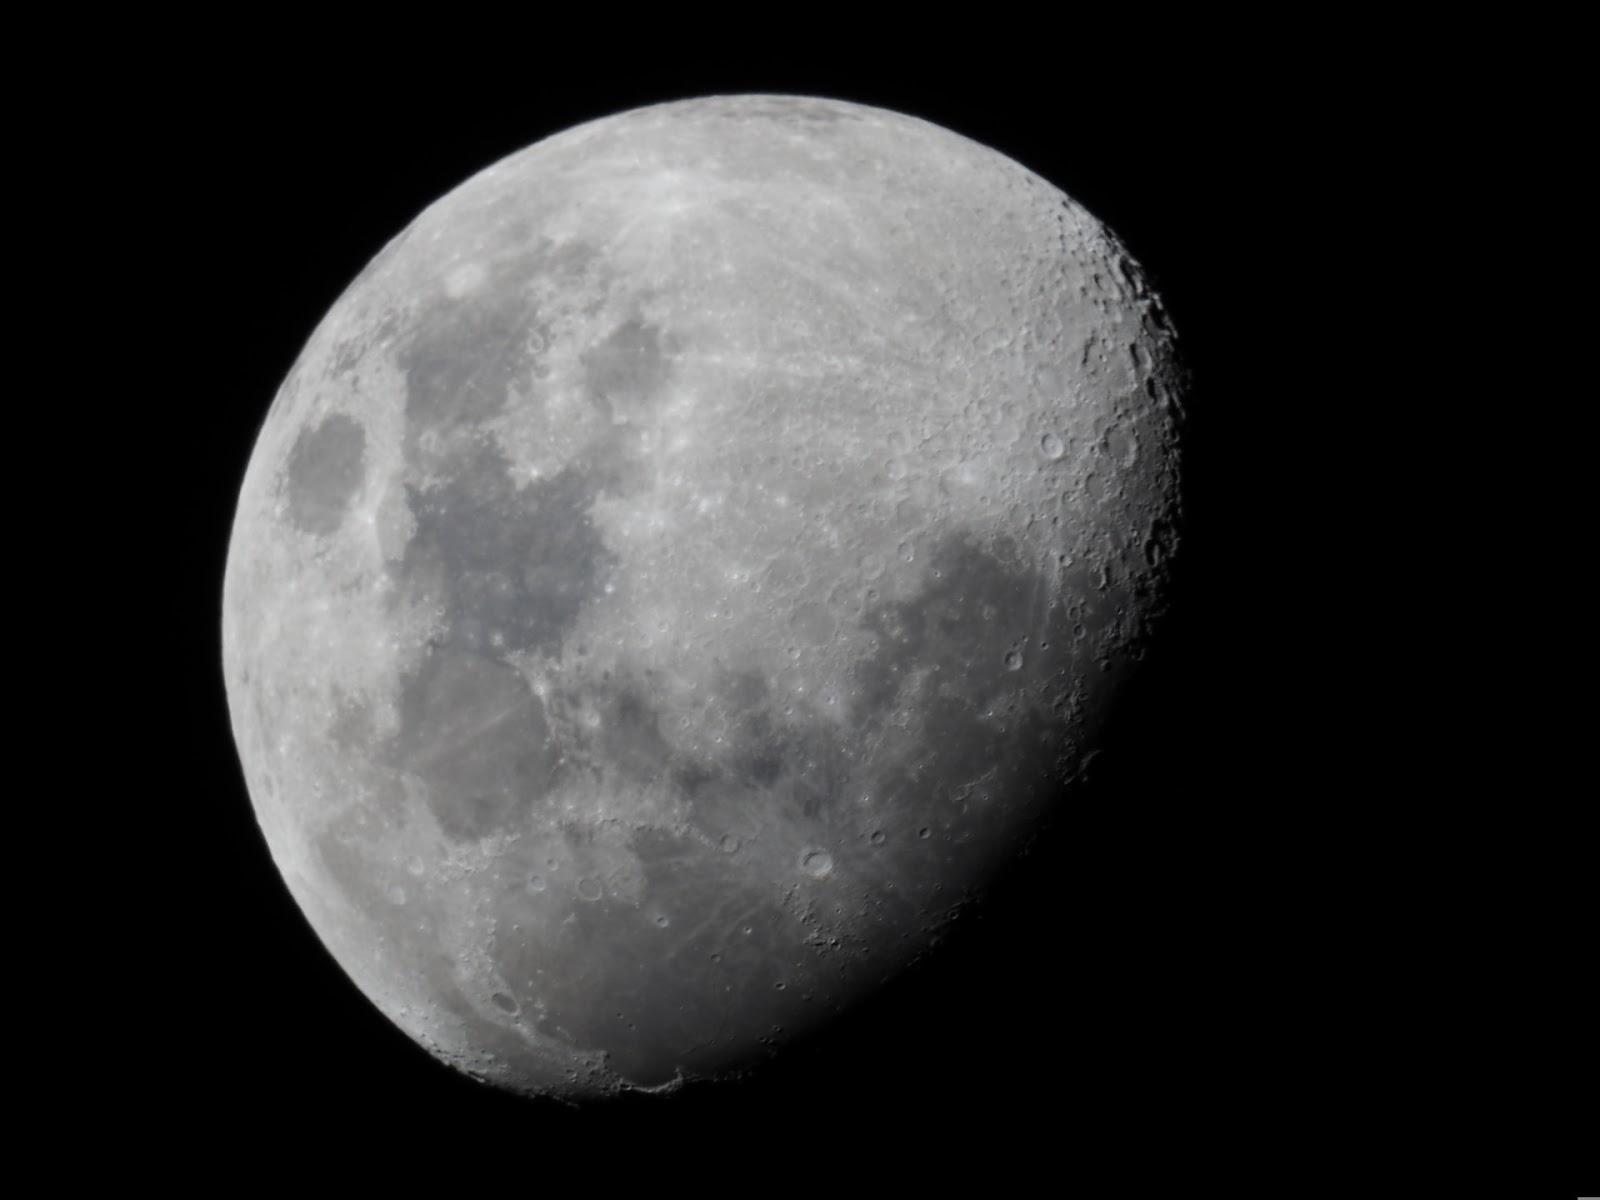 Solar system astrophotography